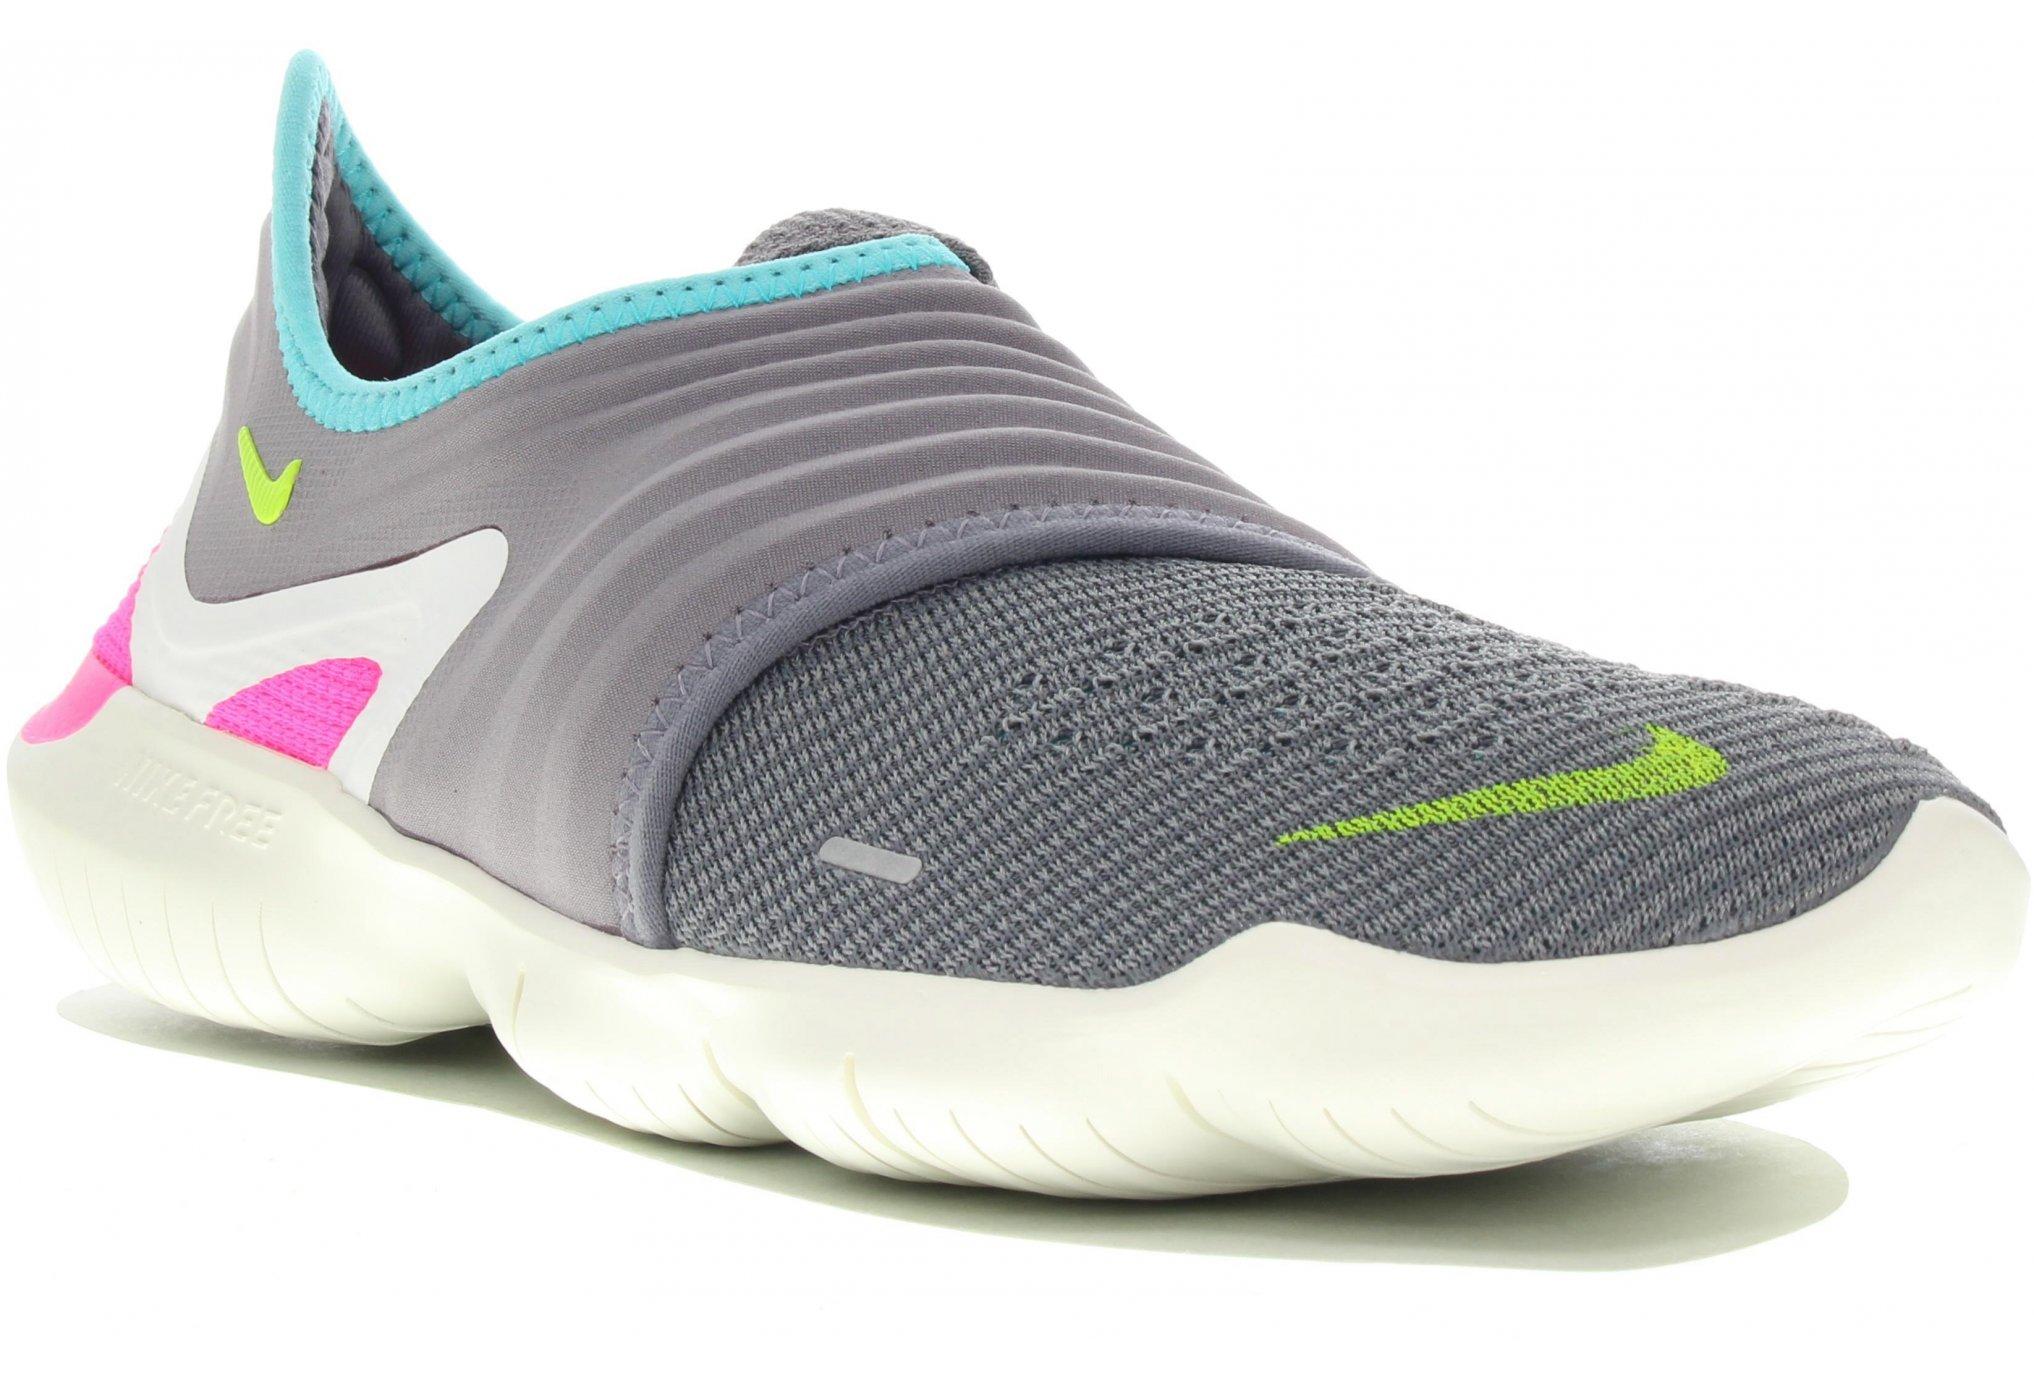 Nike Free RN Flyknit 3.0 W Diététique Chaussures femme